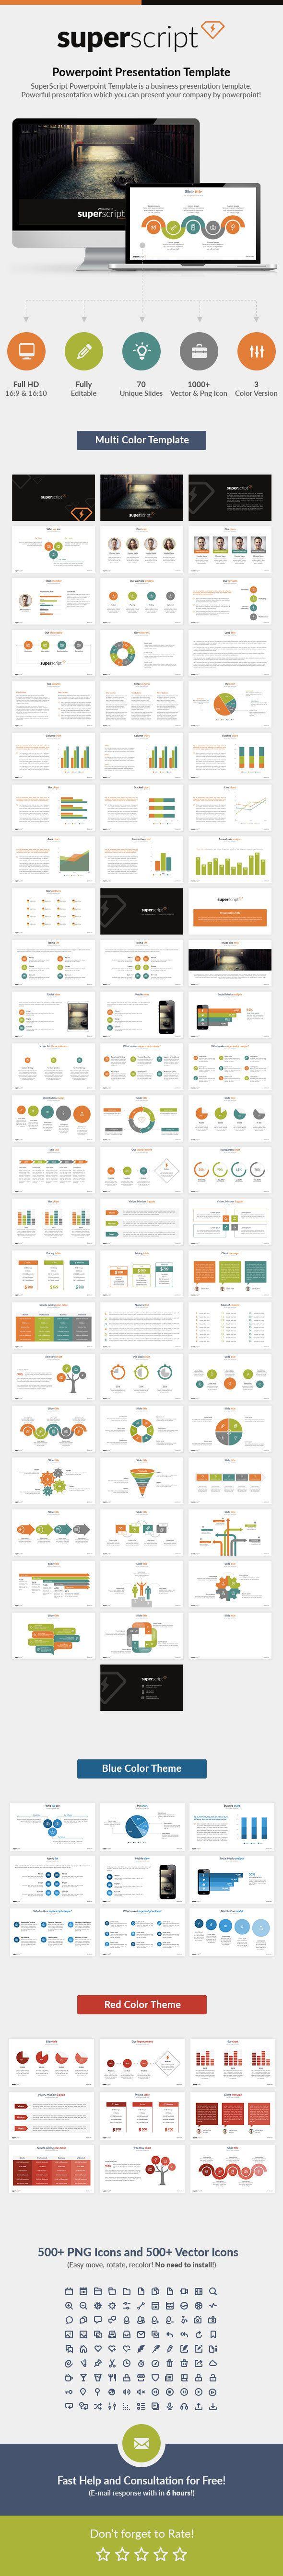 Superscript Powerpoint Presentation Template (PowerPoint Templates)